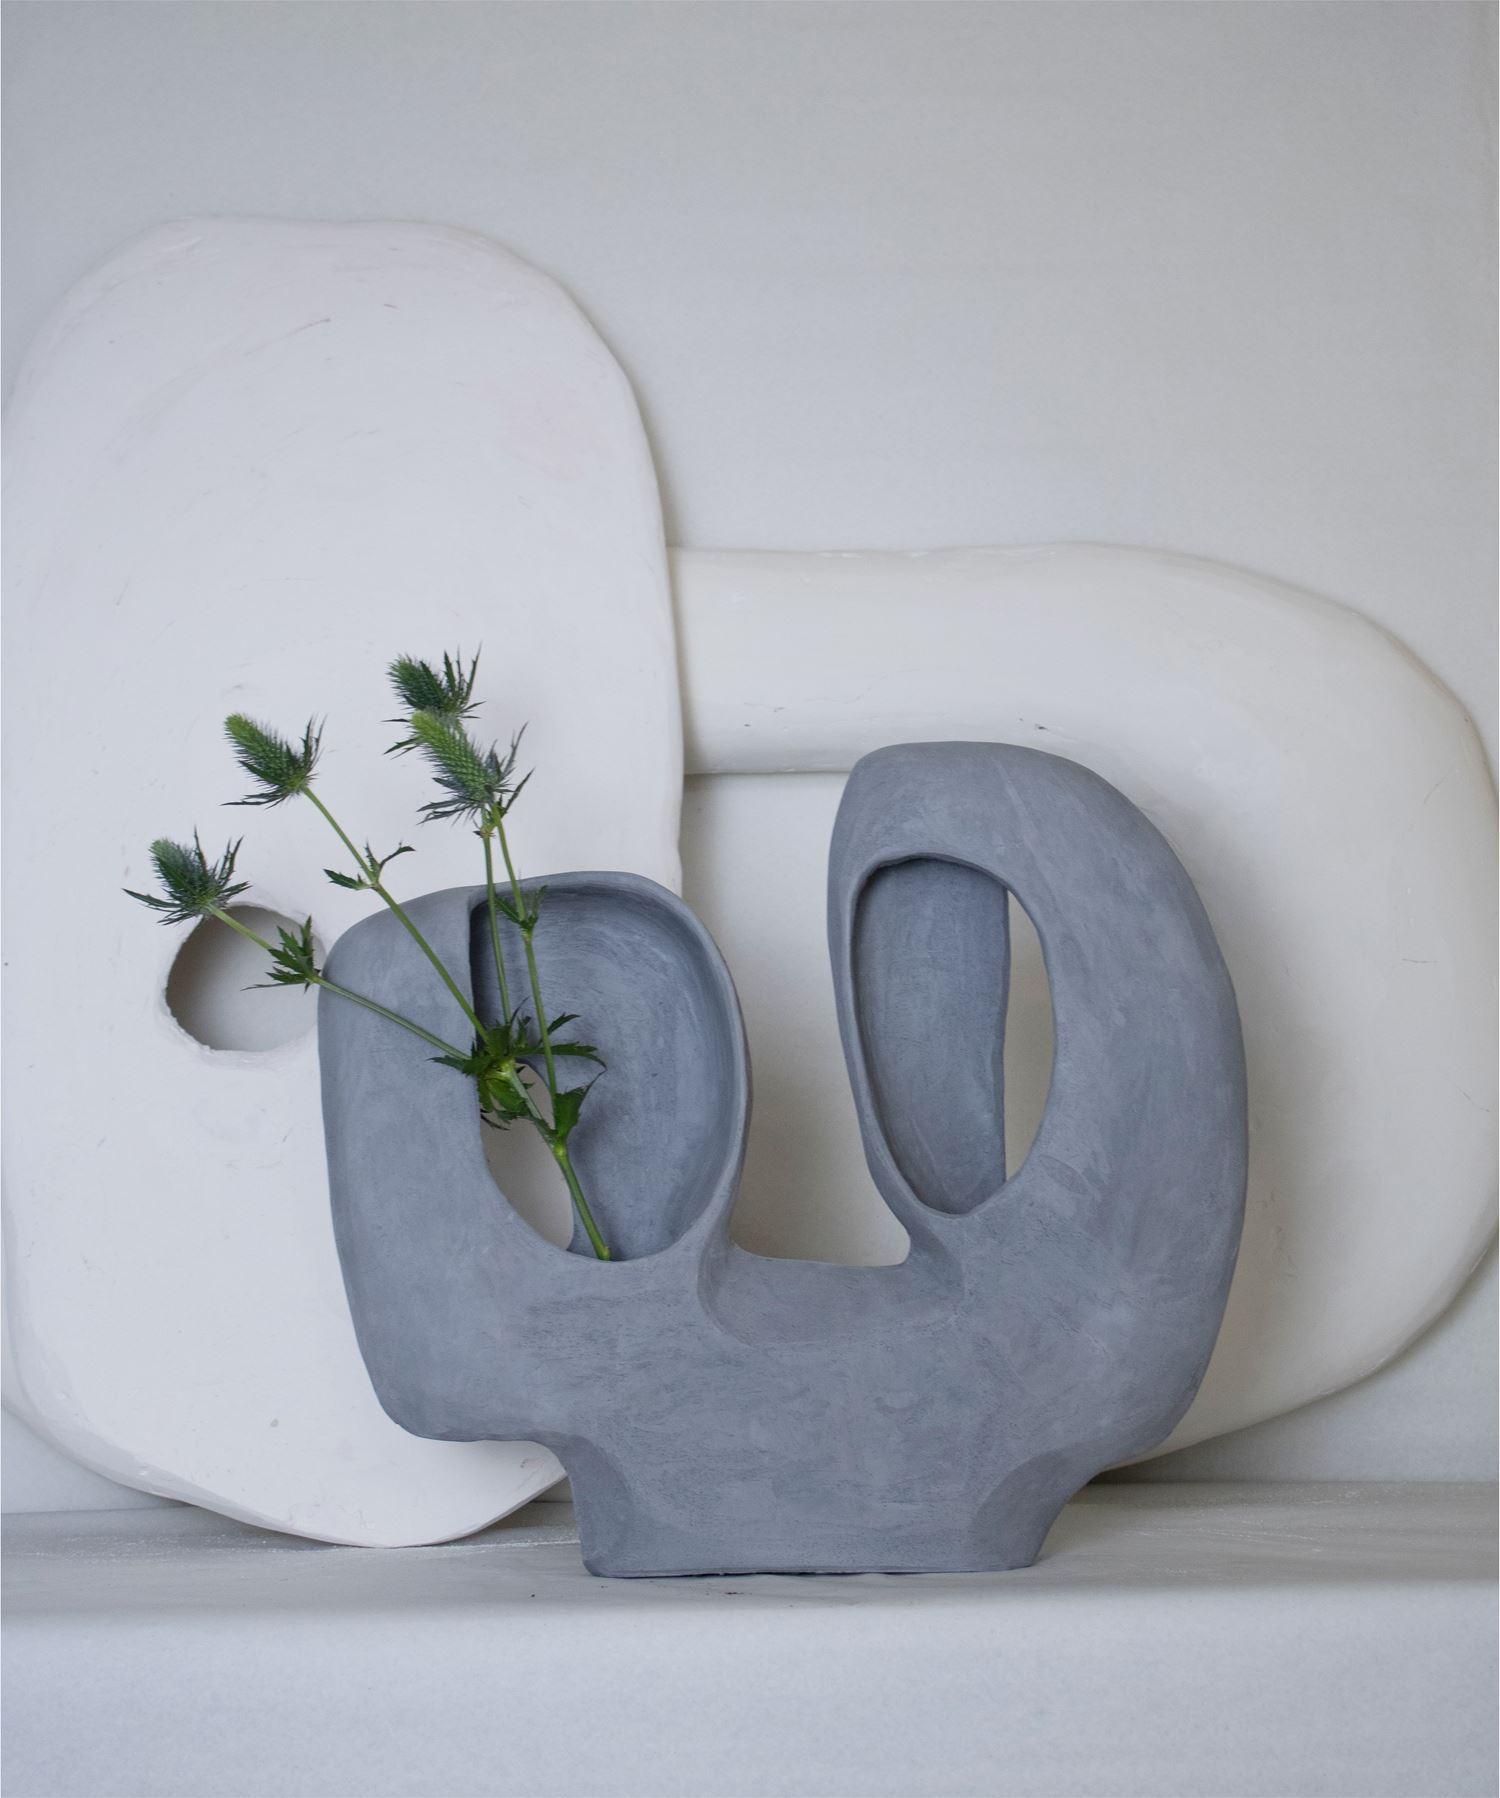 Strzyzynska_Living_Forms_Collection_designalive-14